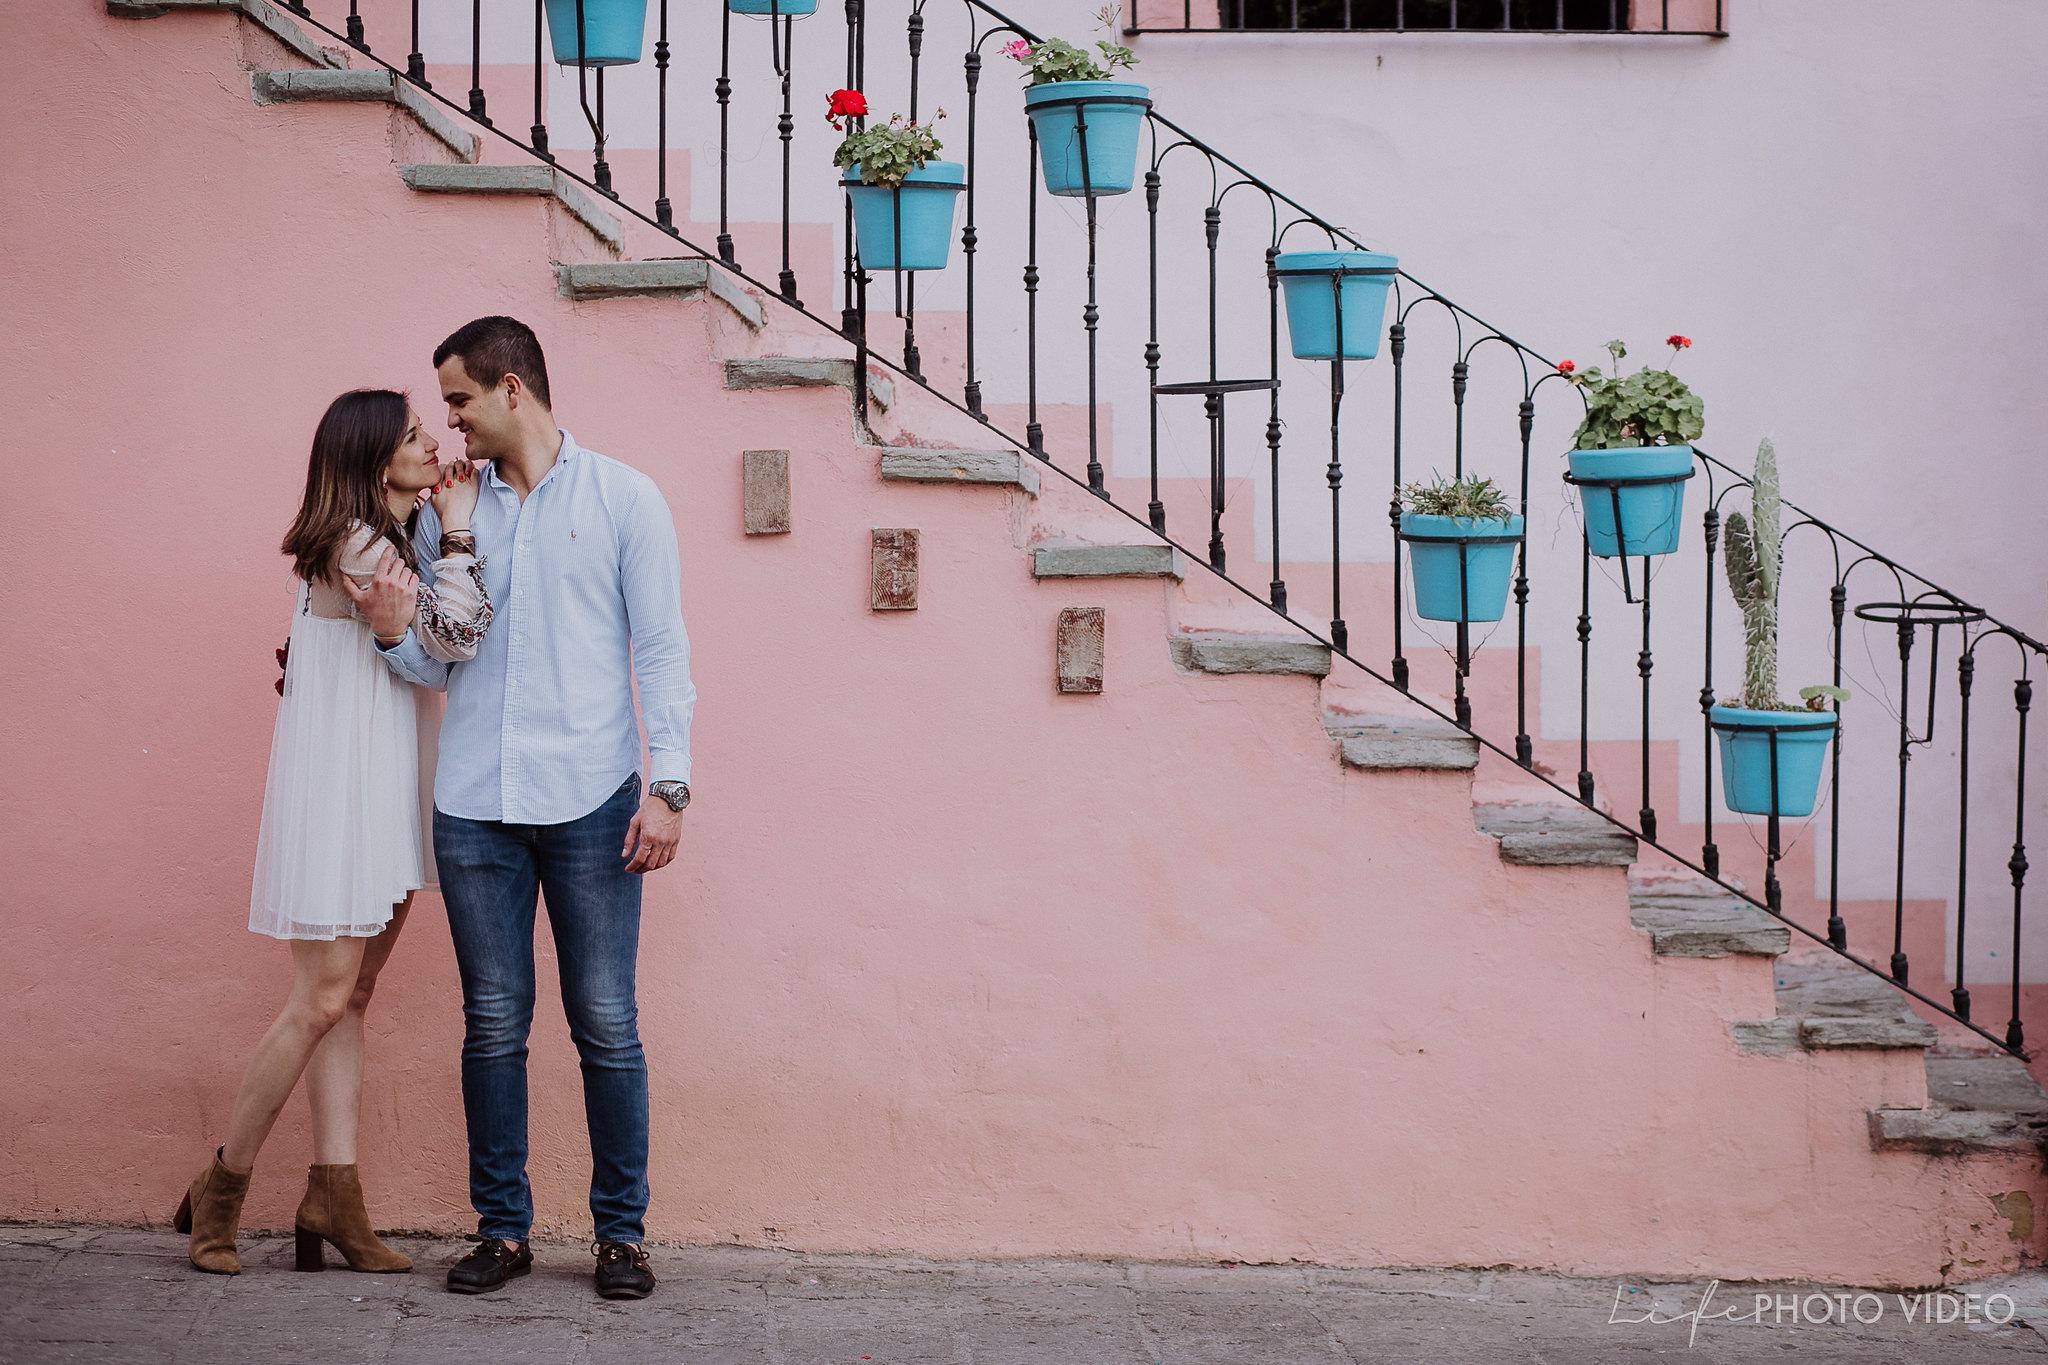 171217_Guanajuato_Photographer_0004